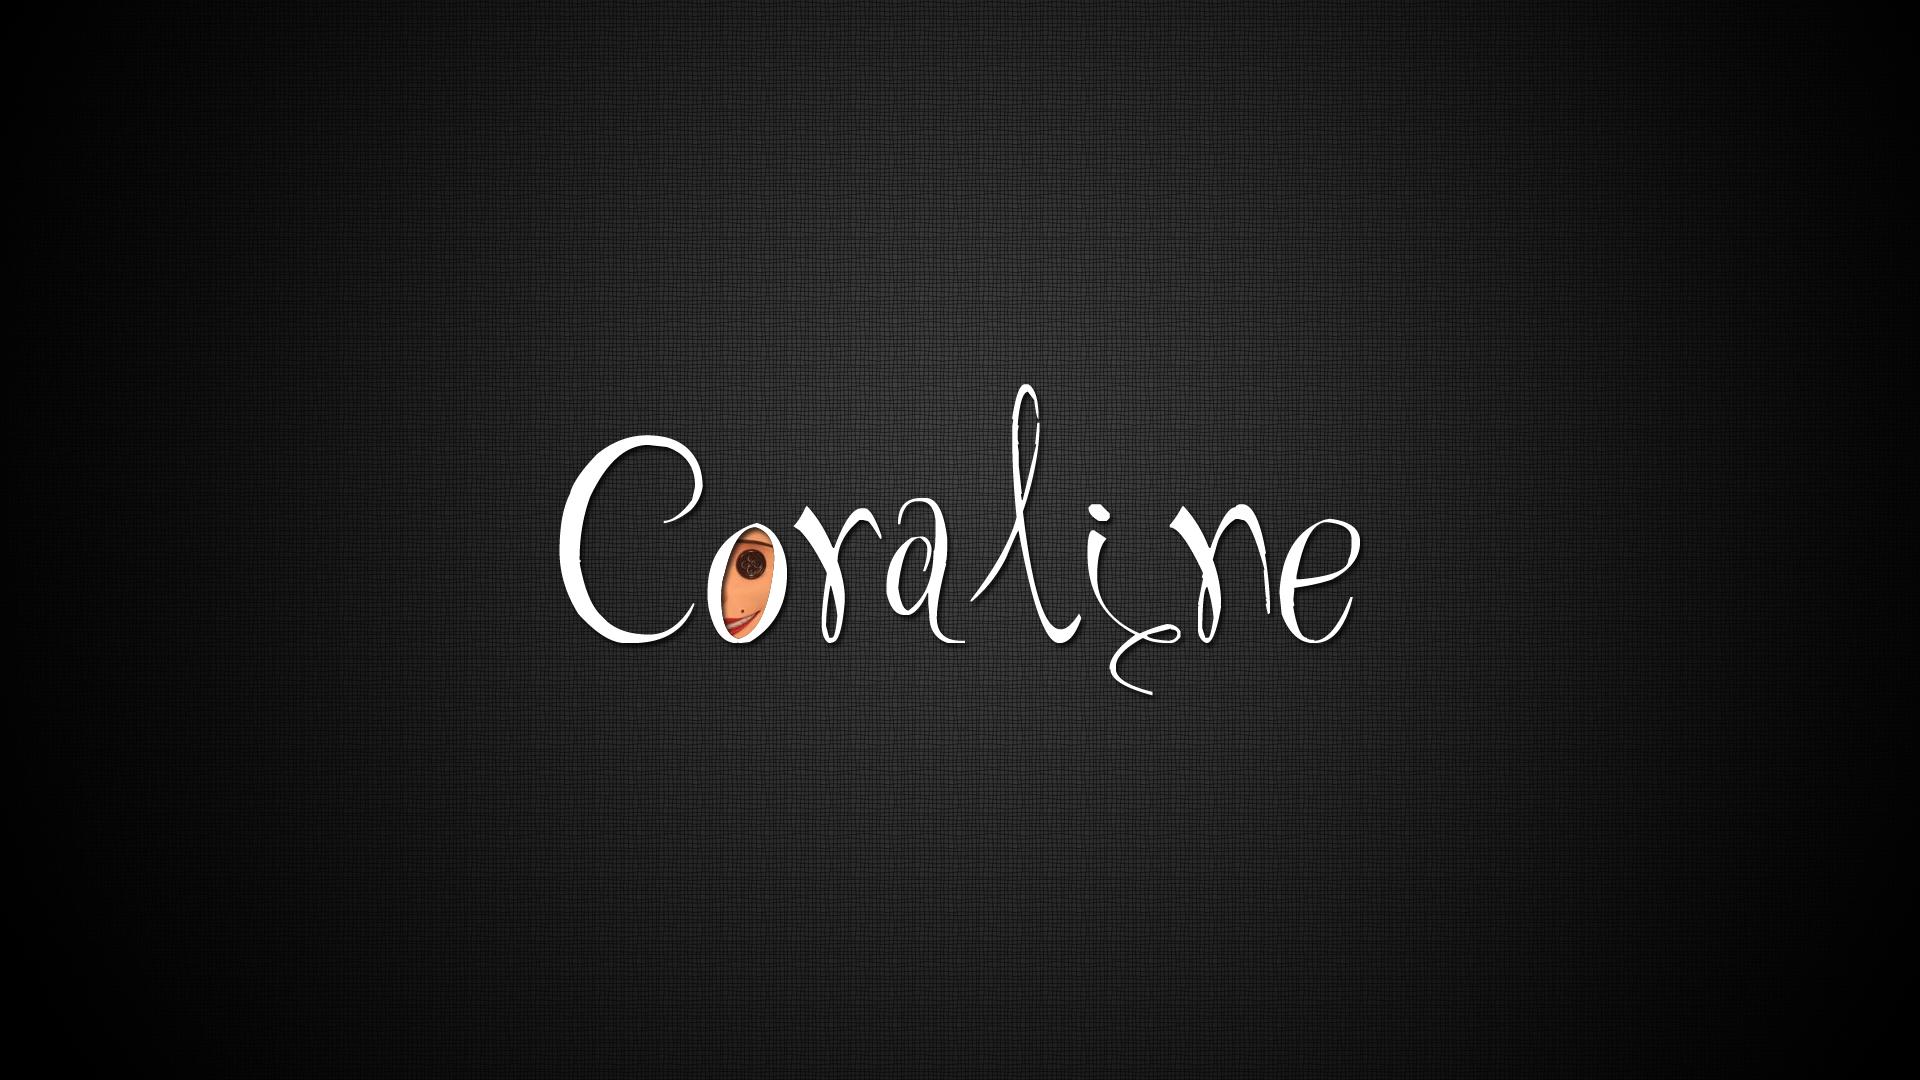 Fondos De Pantalla De Caroline: Coraline Wallpaper 1920x1080 By SomebodySlime On DeviantArt